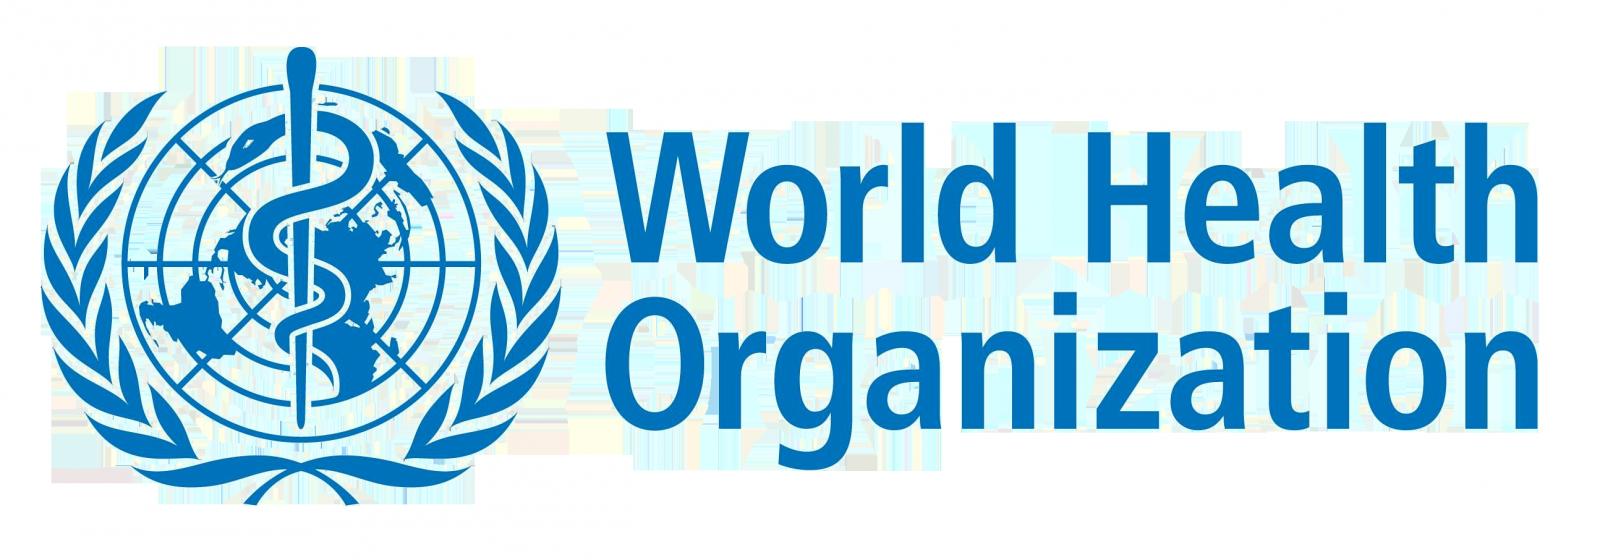 Image result for world health organization mental health